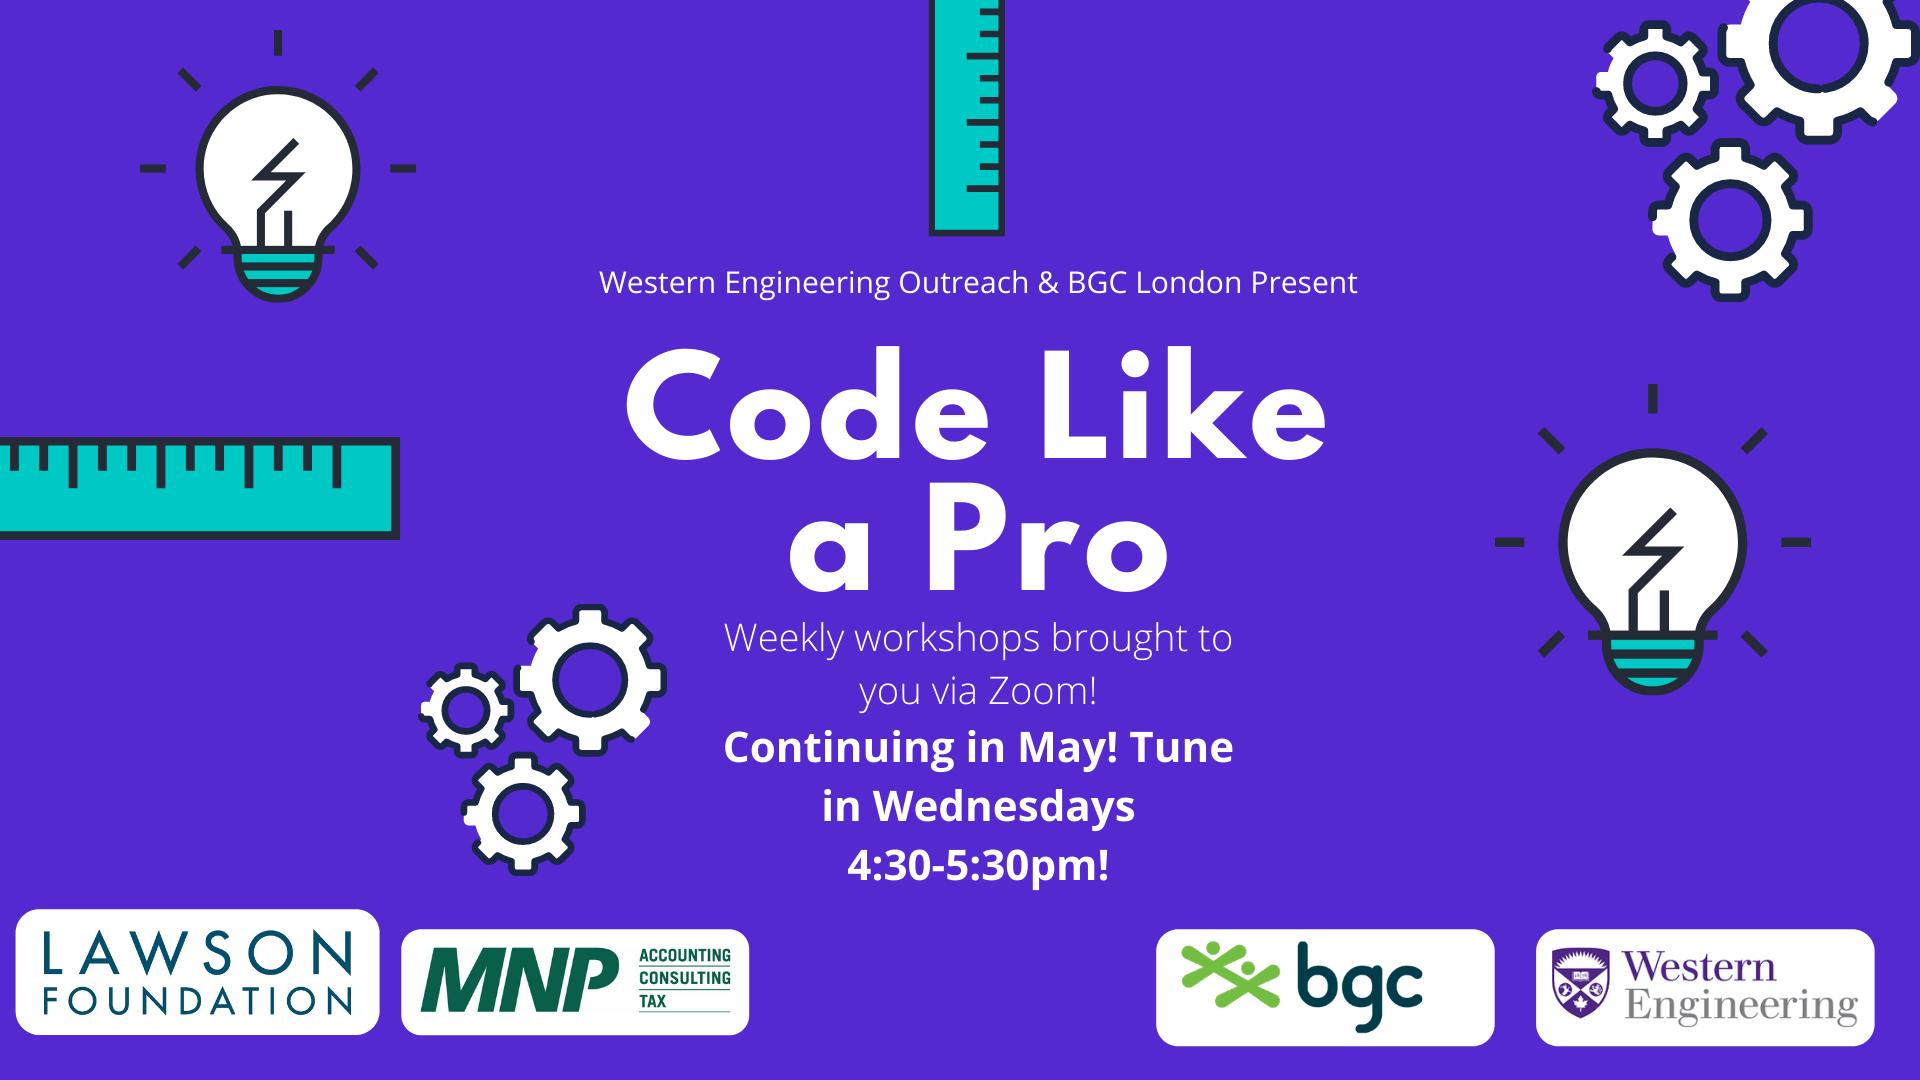 Code Like A Pro